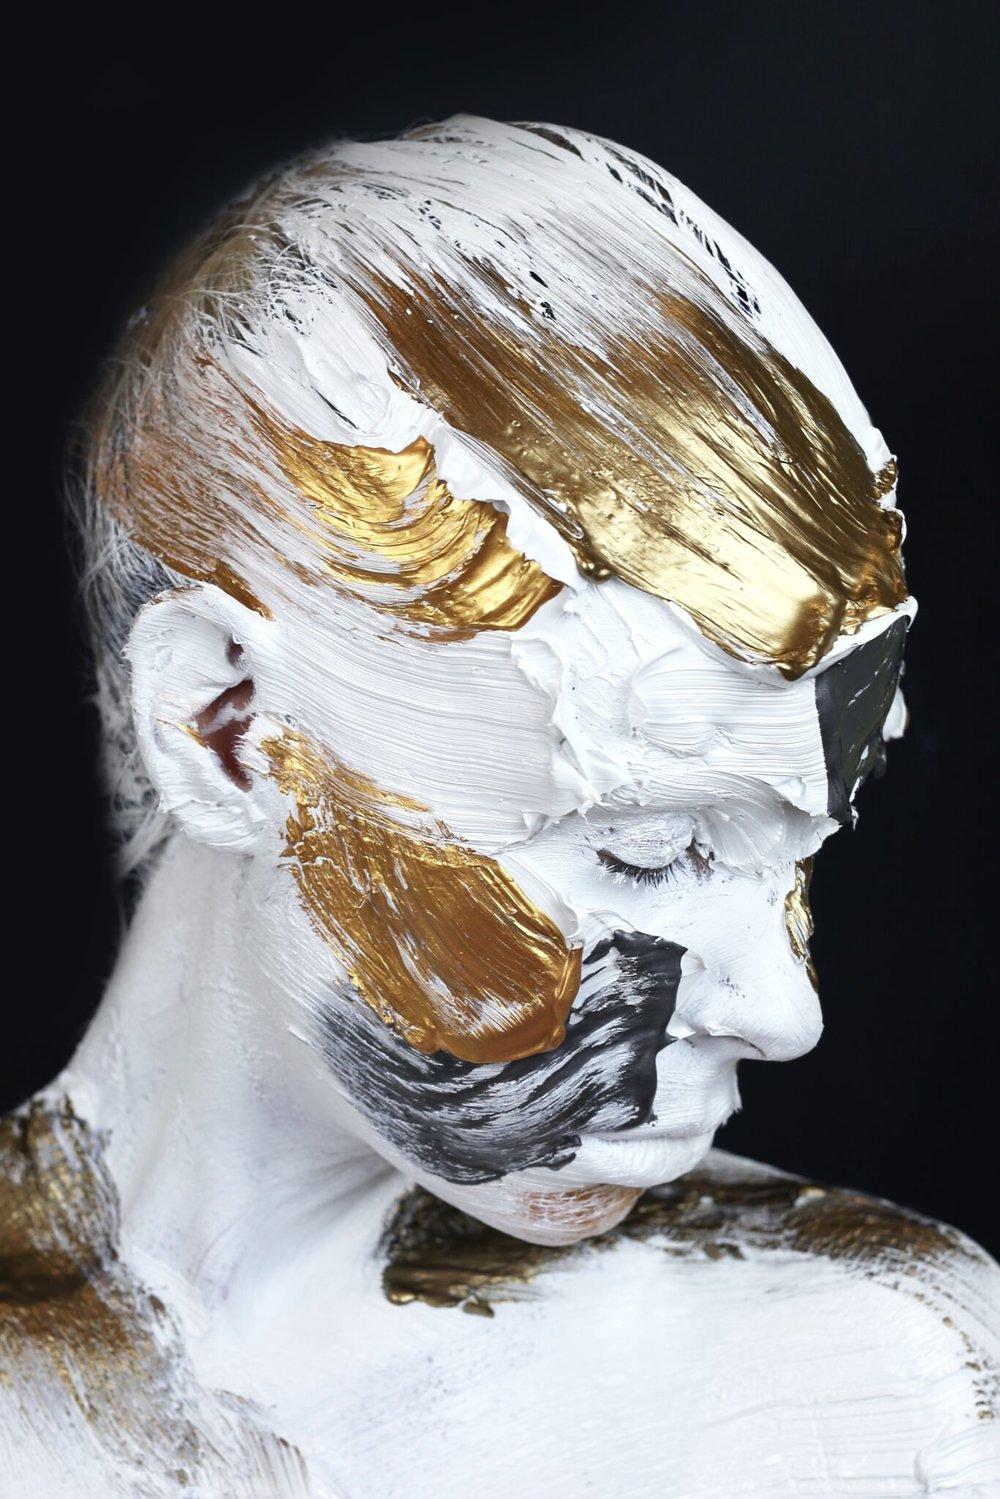 Monochrome Metallics - Black, Bronze, Gold & Steel #3